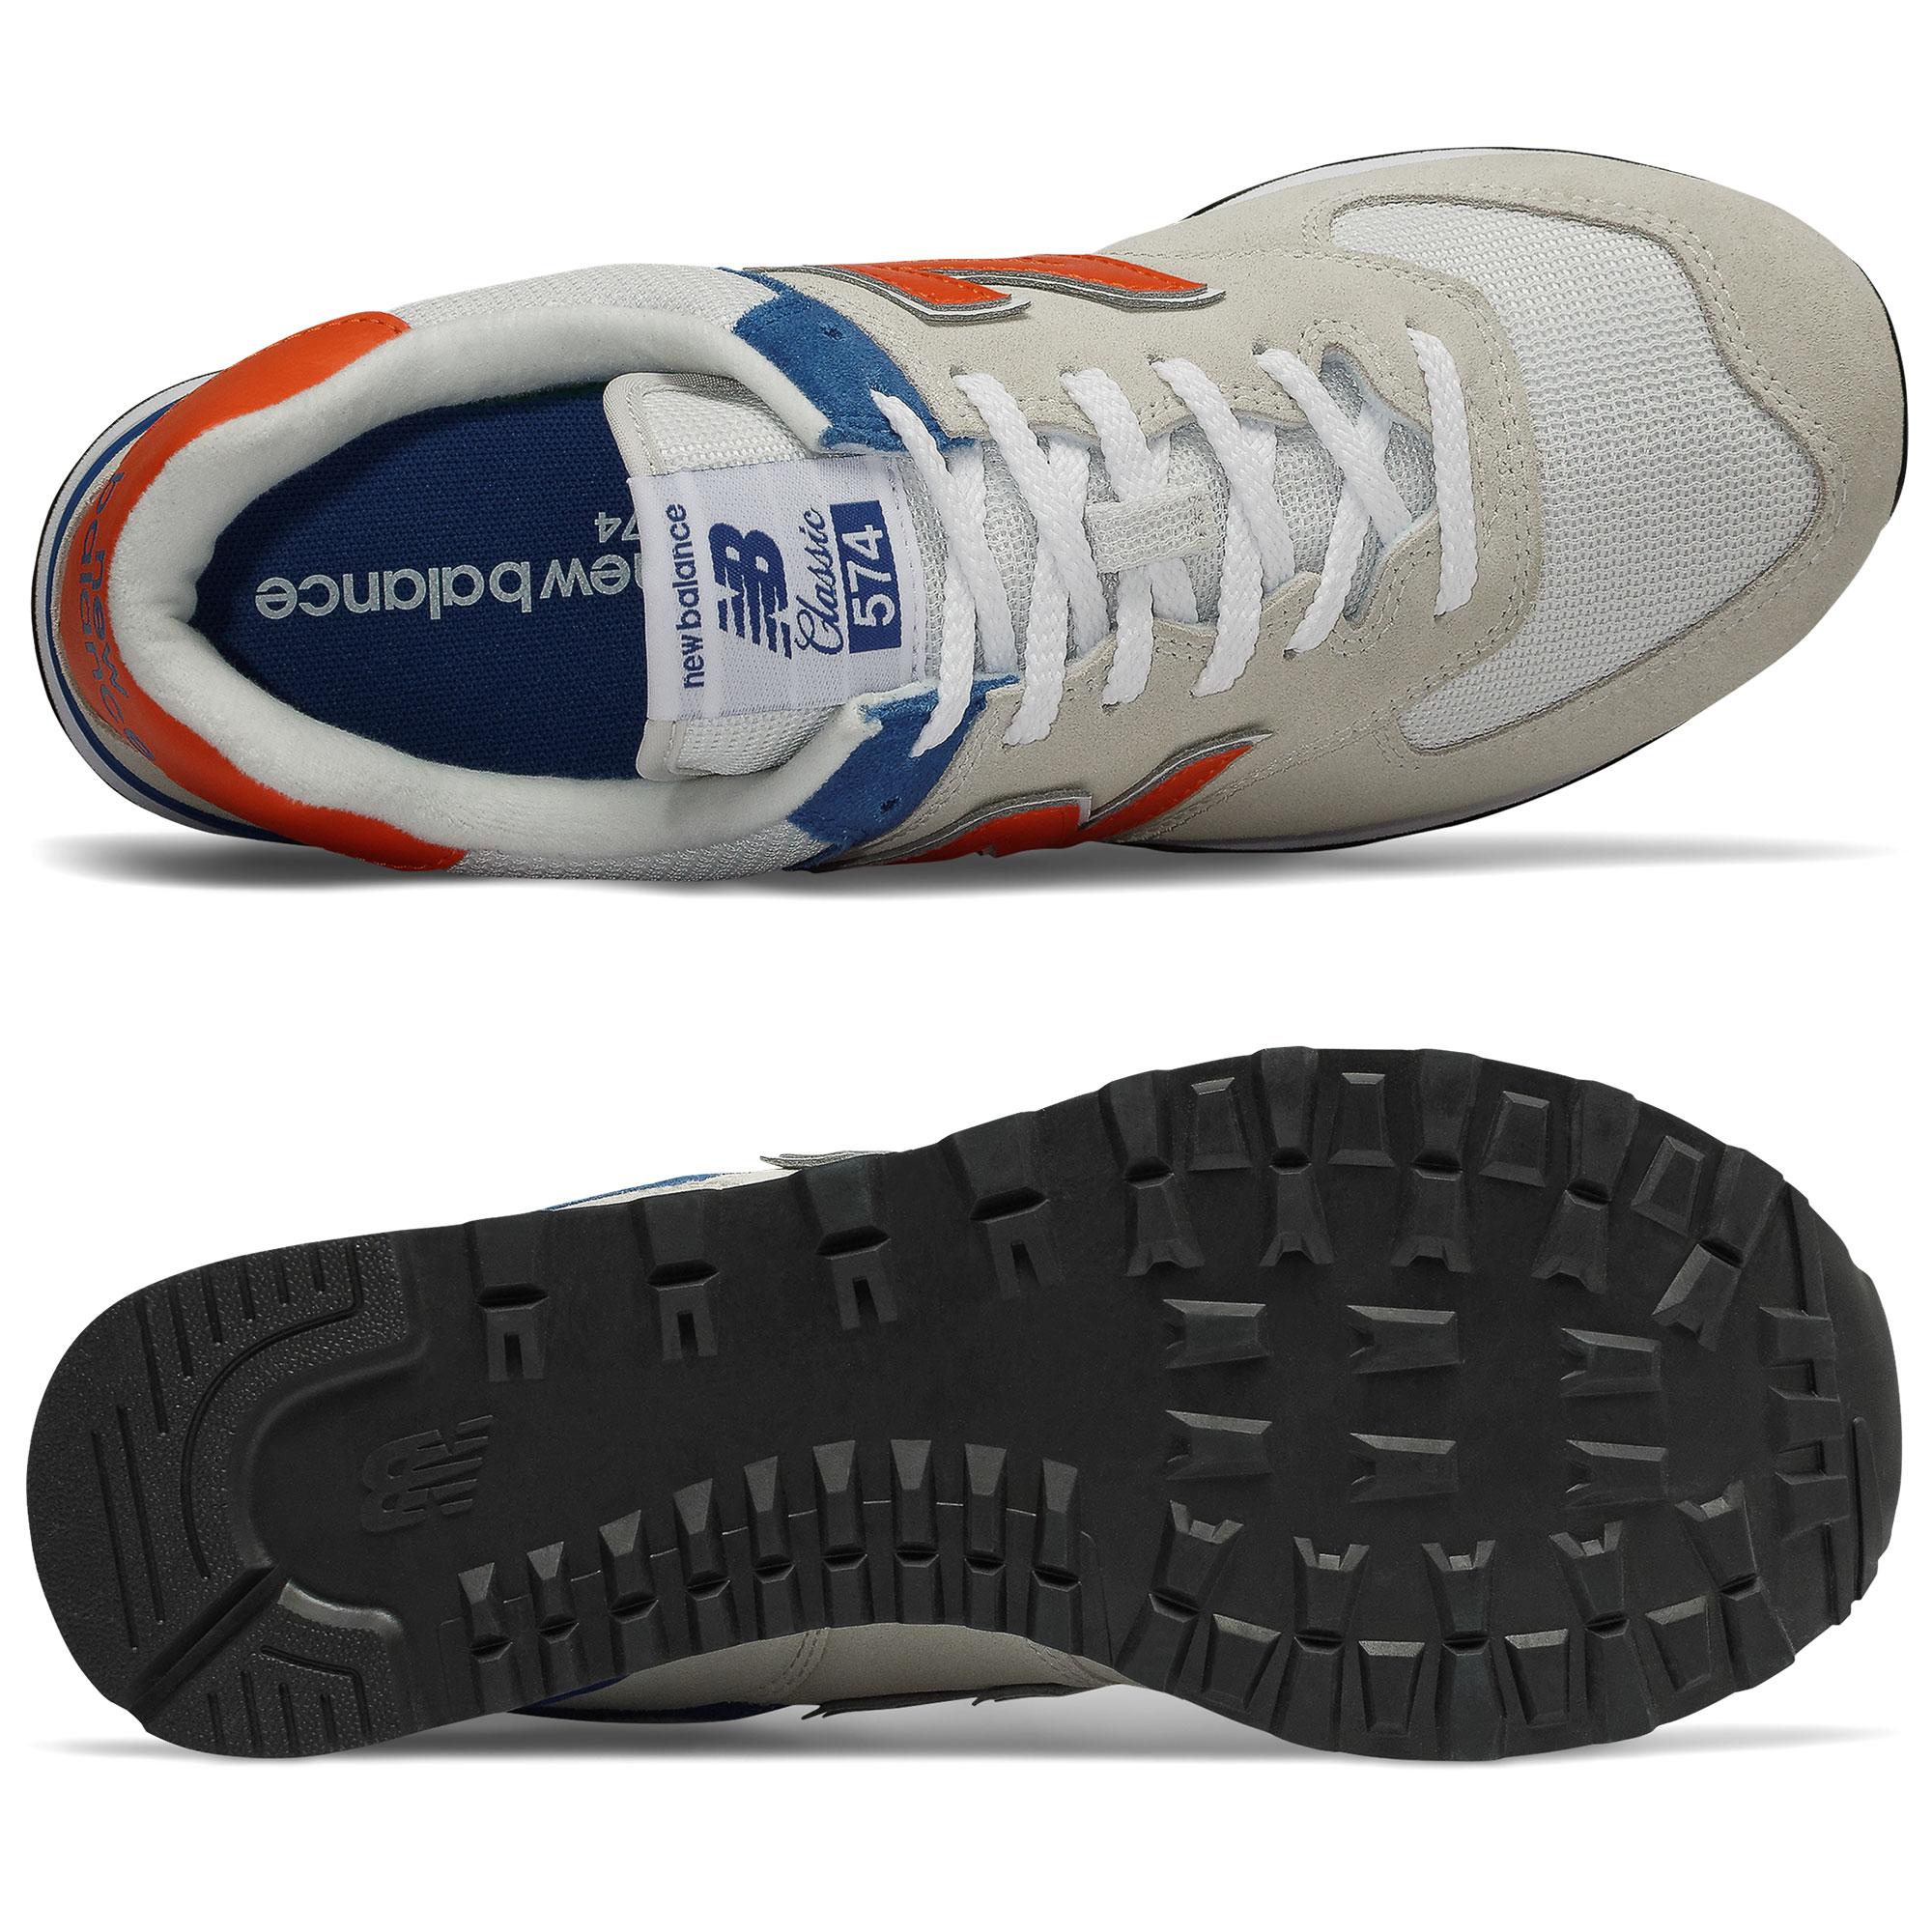 99e0df8329f New Balance Men s 574 Casual Shoes - Sun   Ski Sports